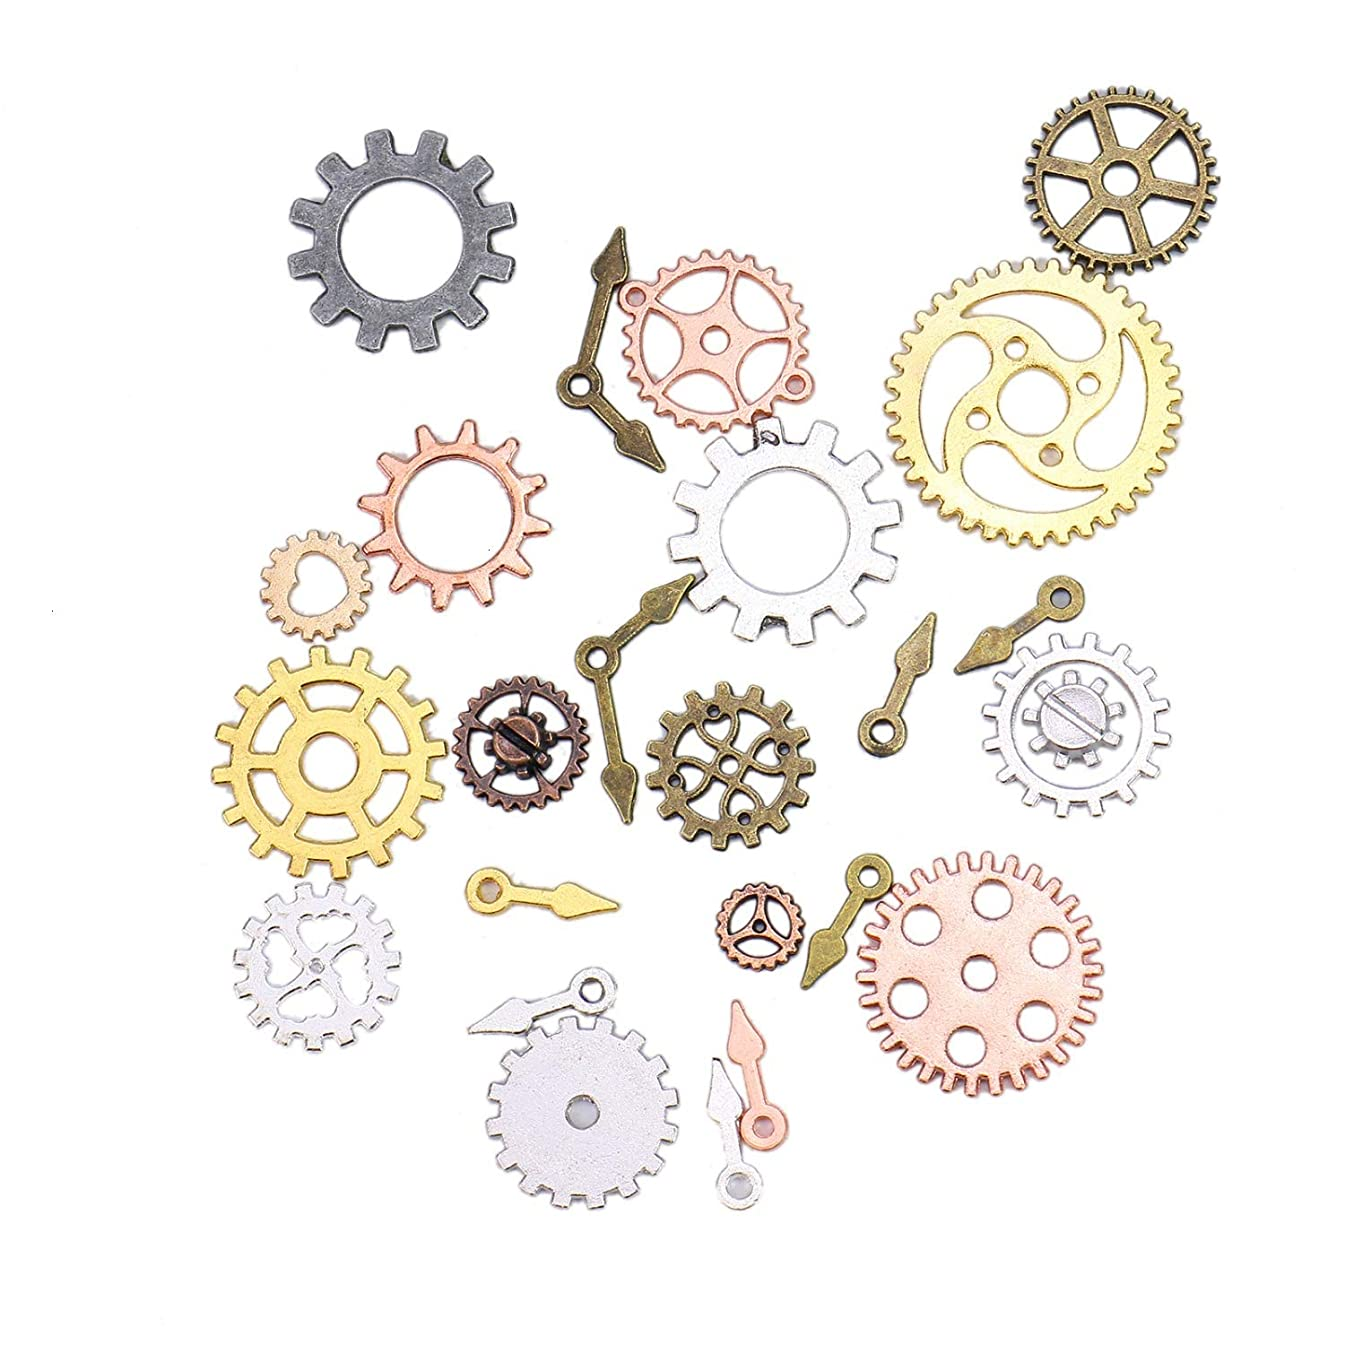 Monrocco 100 Gram Antique Metal Steampunk Gears Charms DIY Pendant Clock Watch Wheel Gear Cog for Jewelry Making